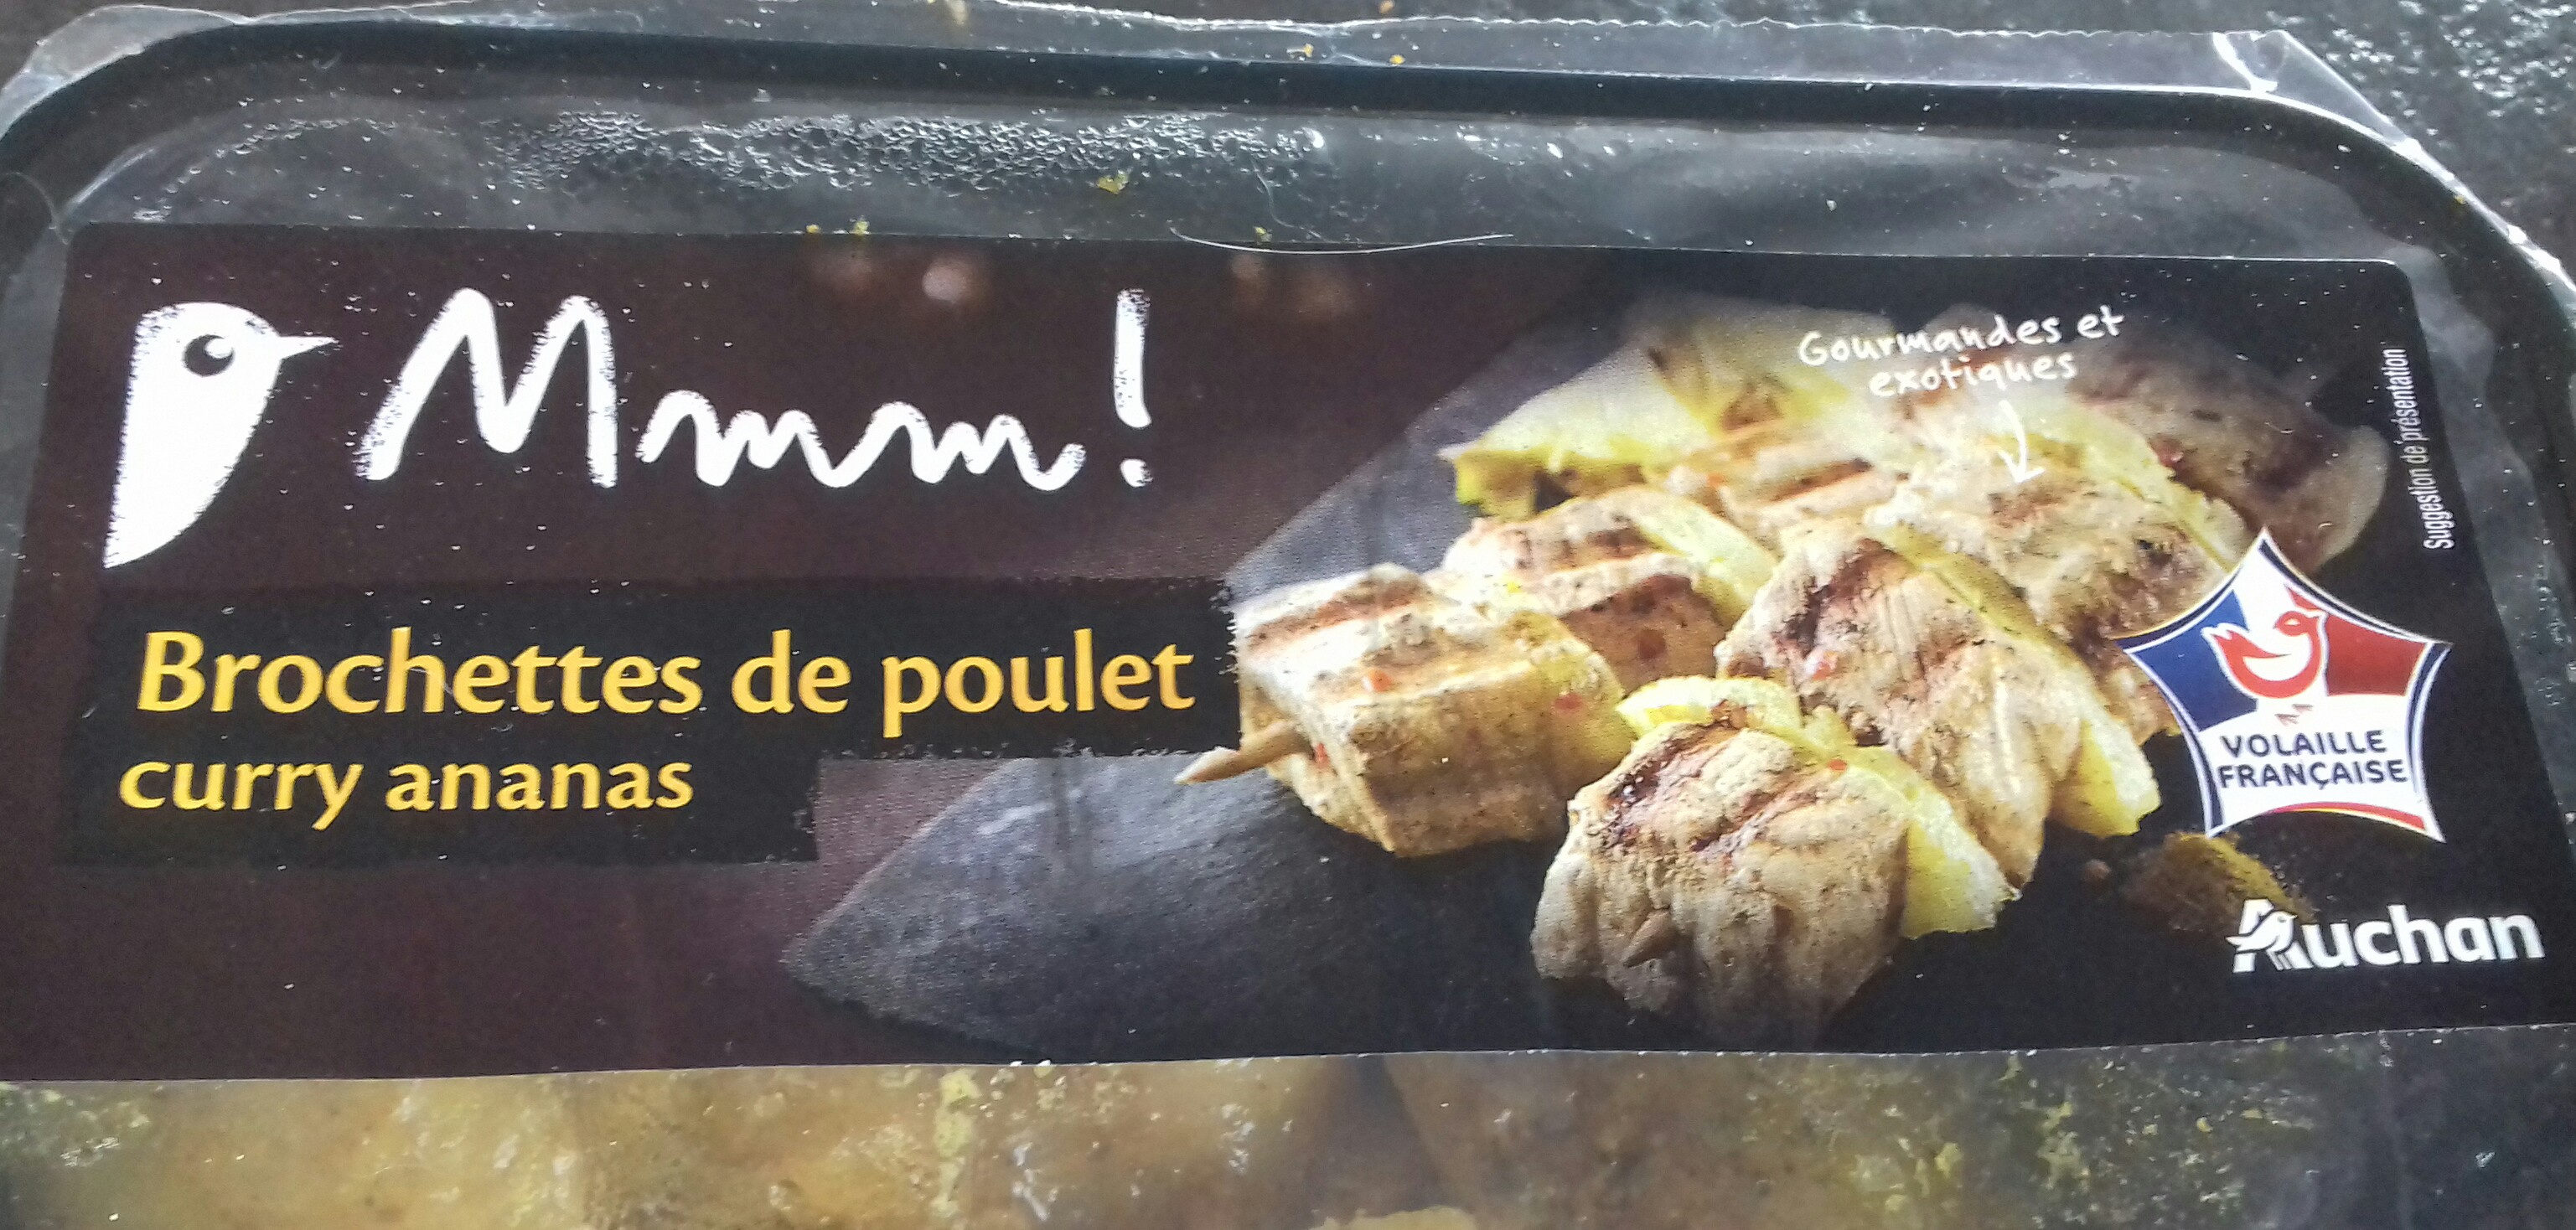 brochettes de poulet curry ananas - Product - fr